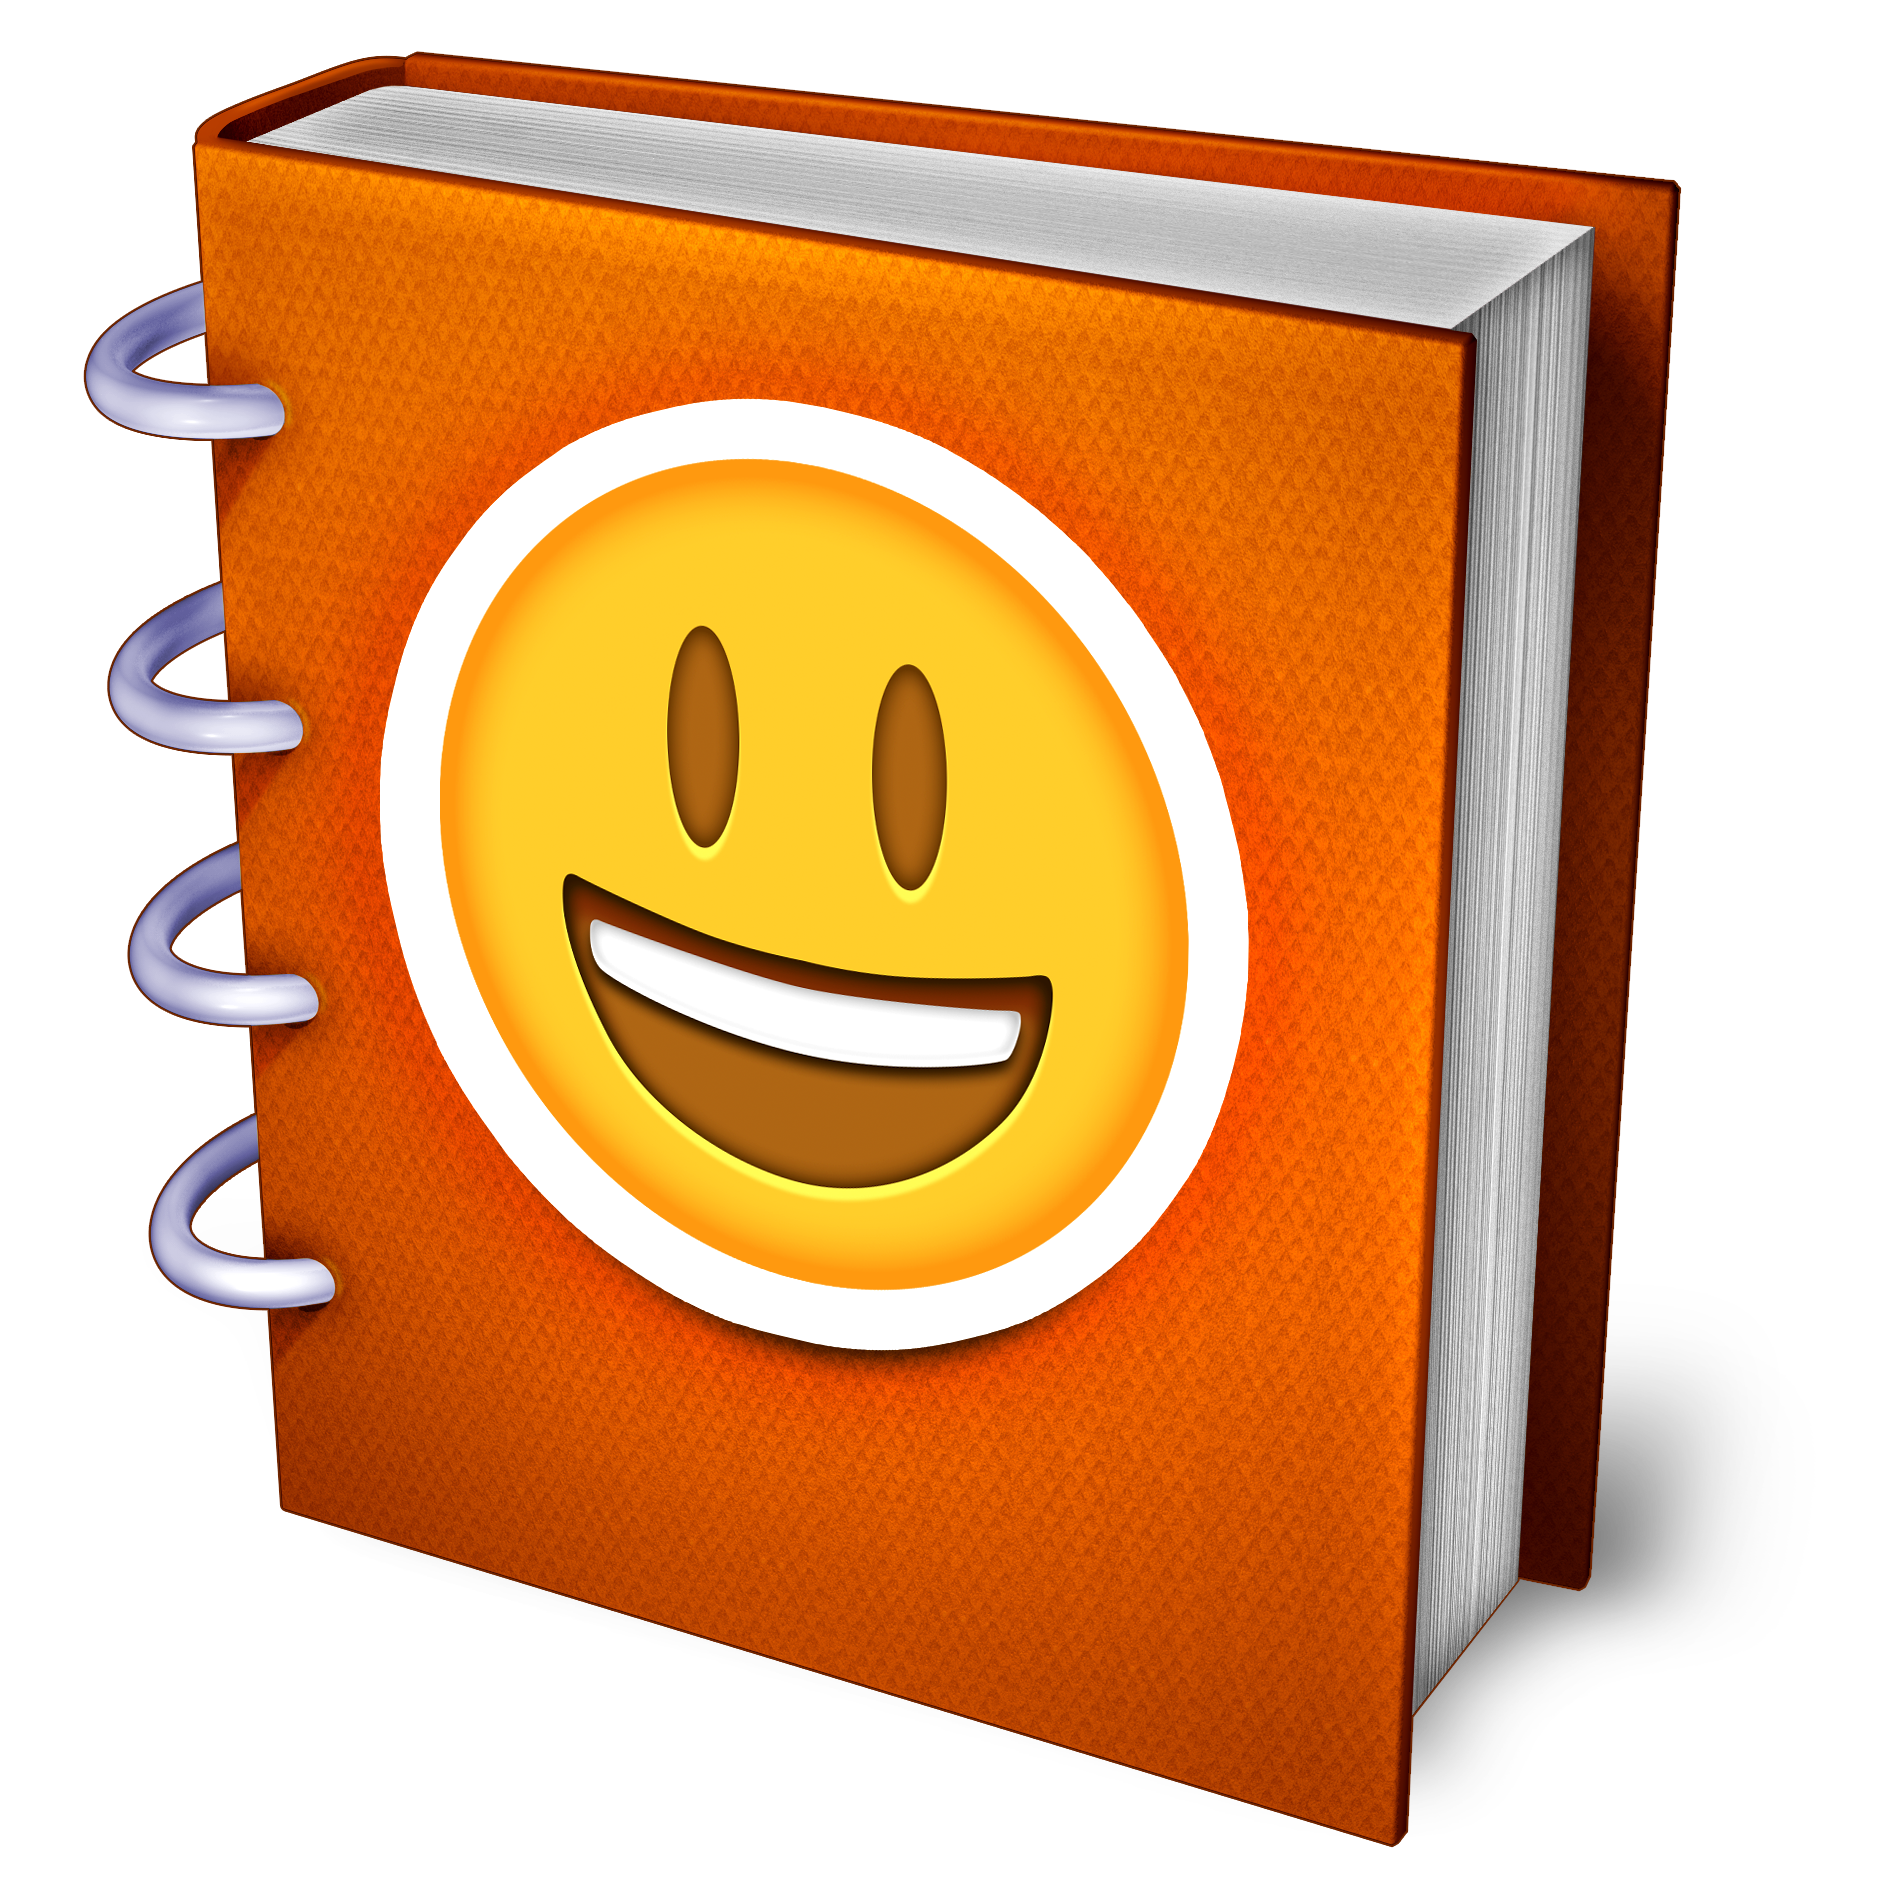 Ios 9 1 Includes New Emojis New Emojis Emoji List Emoji